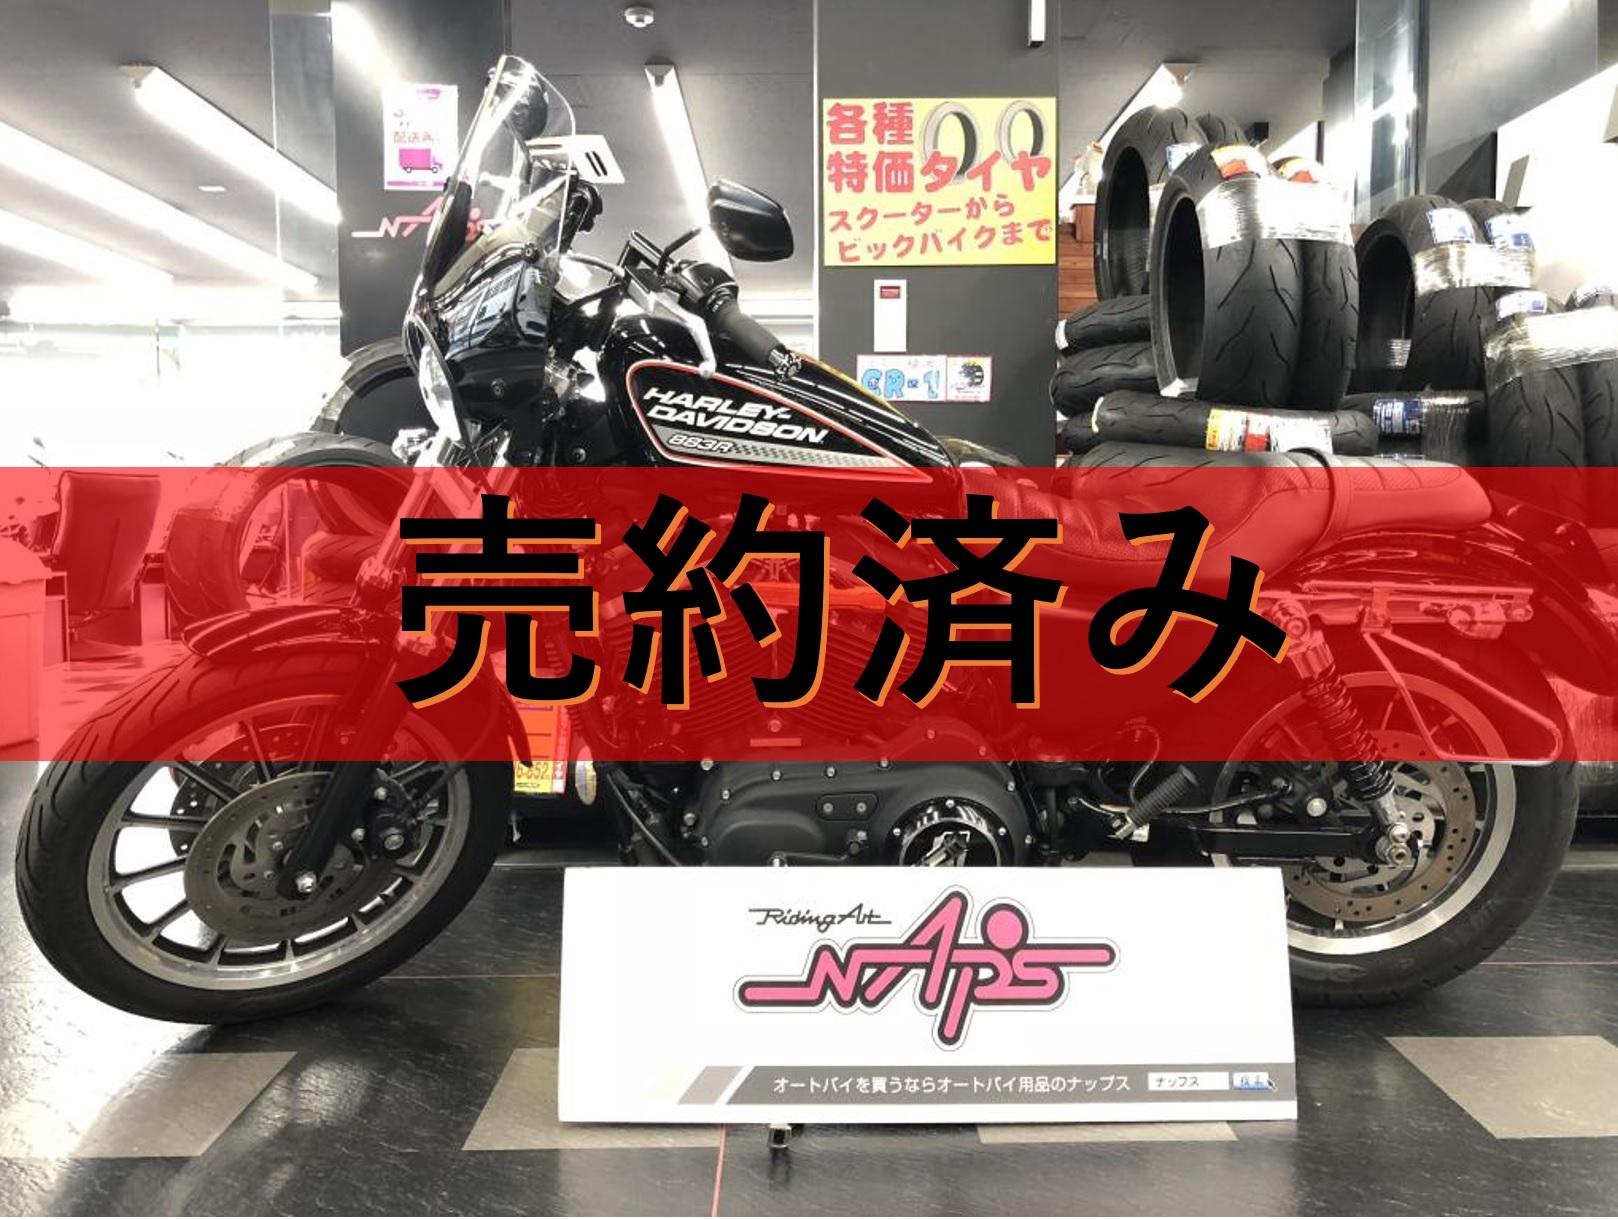 HARLEY-DAVIDSON 【販売車両】XL883R ニーグリップバー 社外エアクリーナー フロントカウル